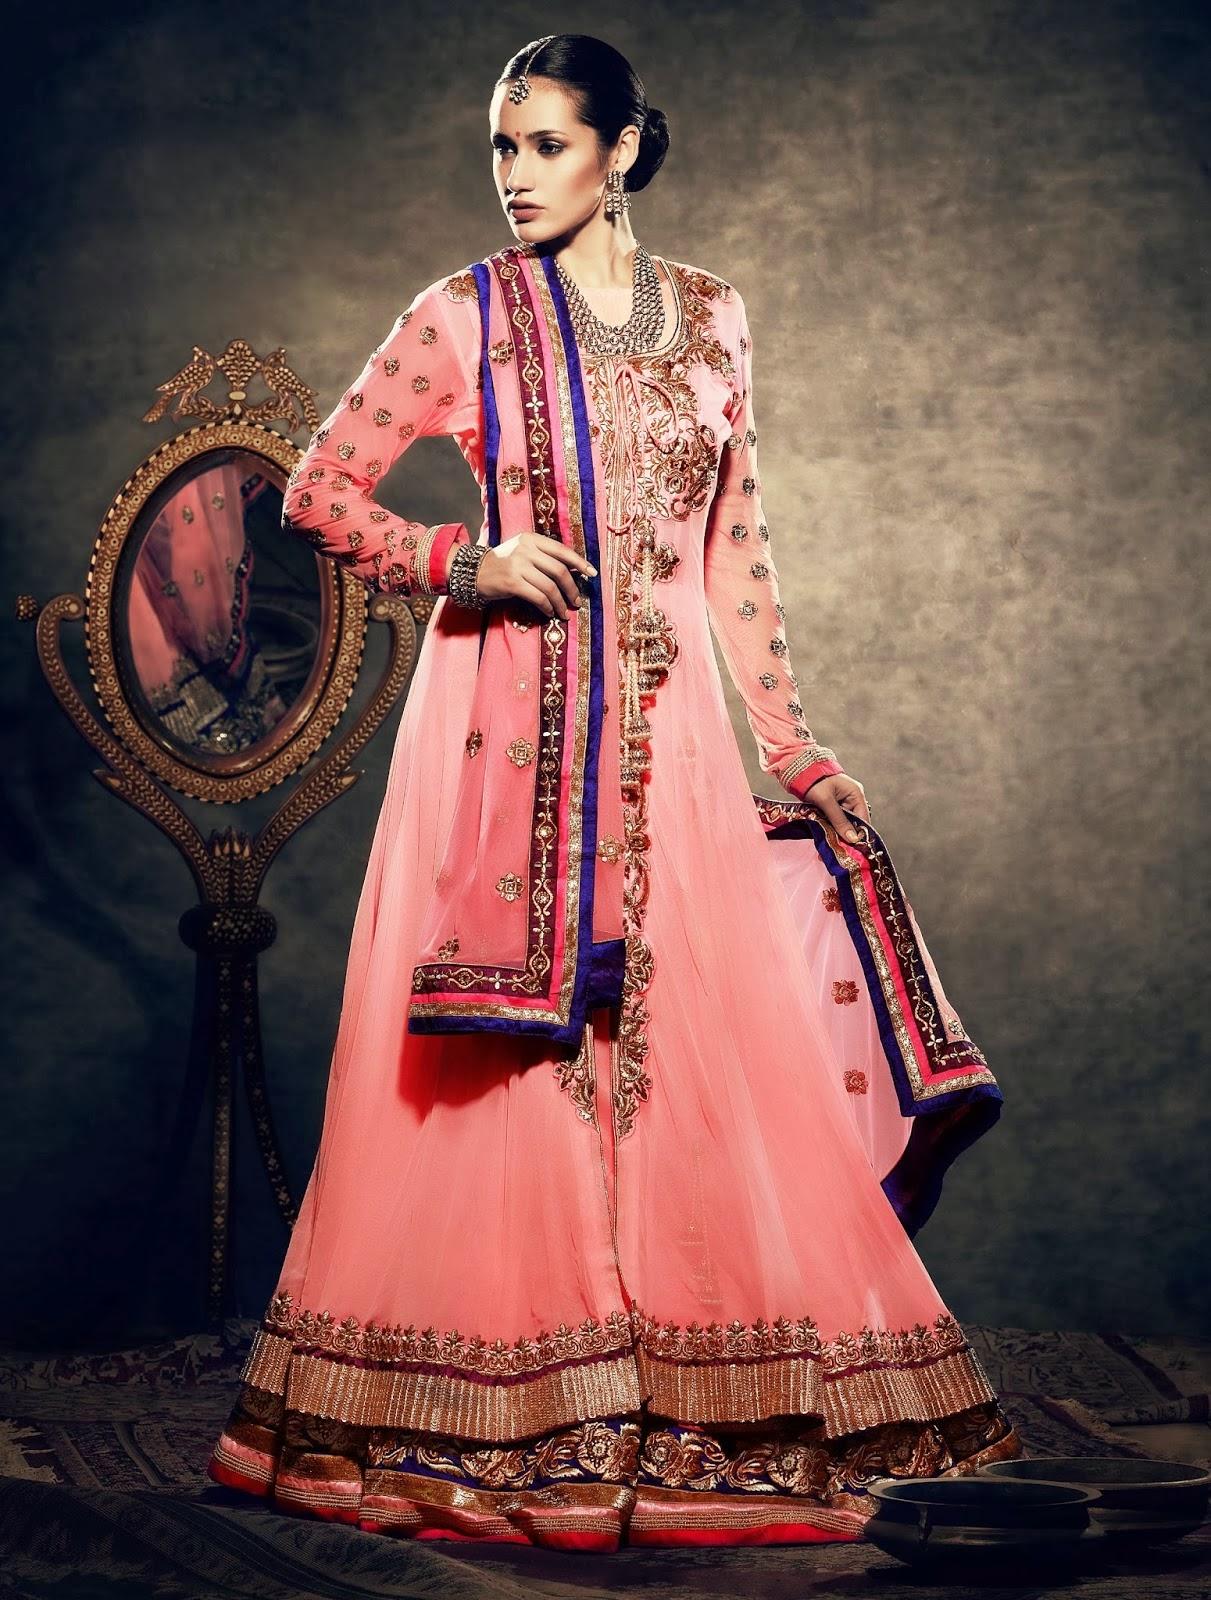 fc29ffcc00 Pakistani Bridal Dresses Buy | Saddha